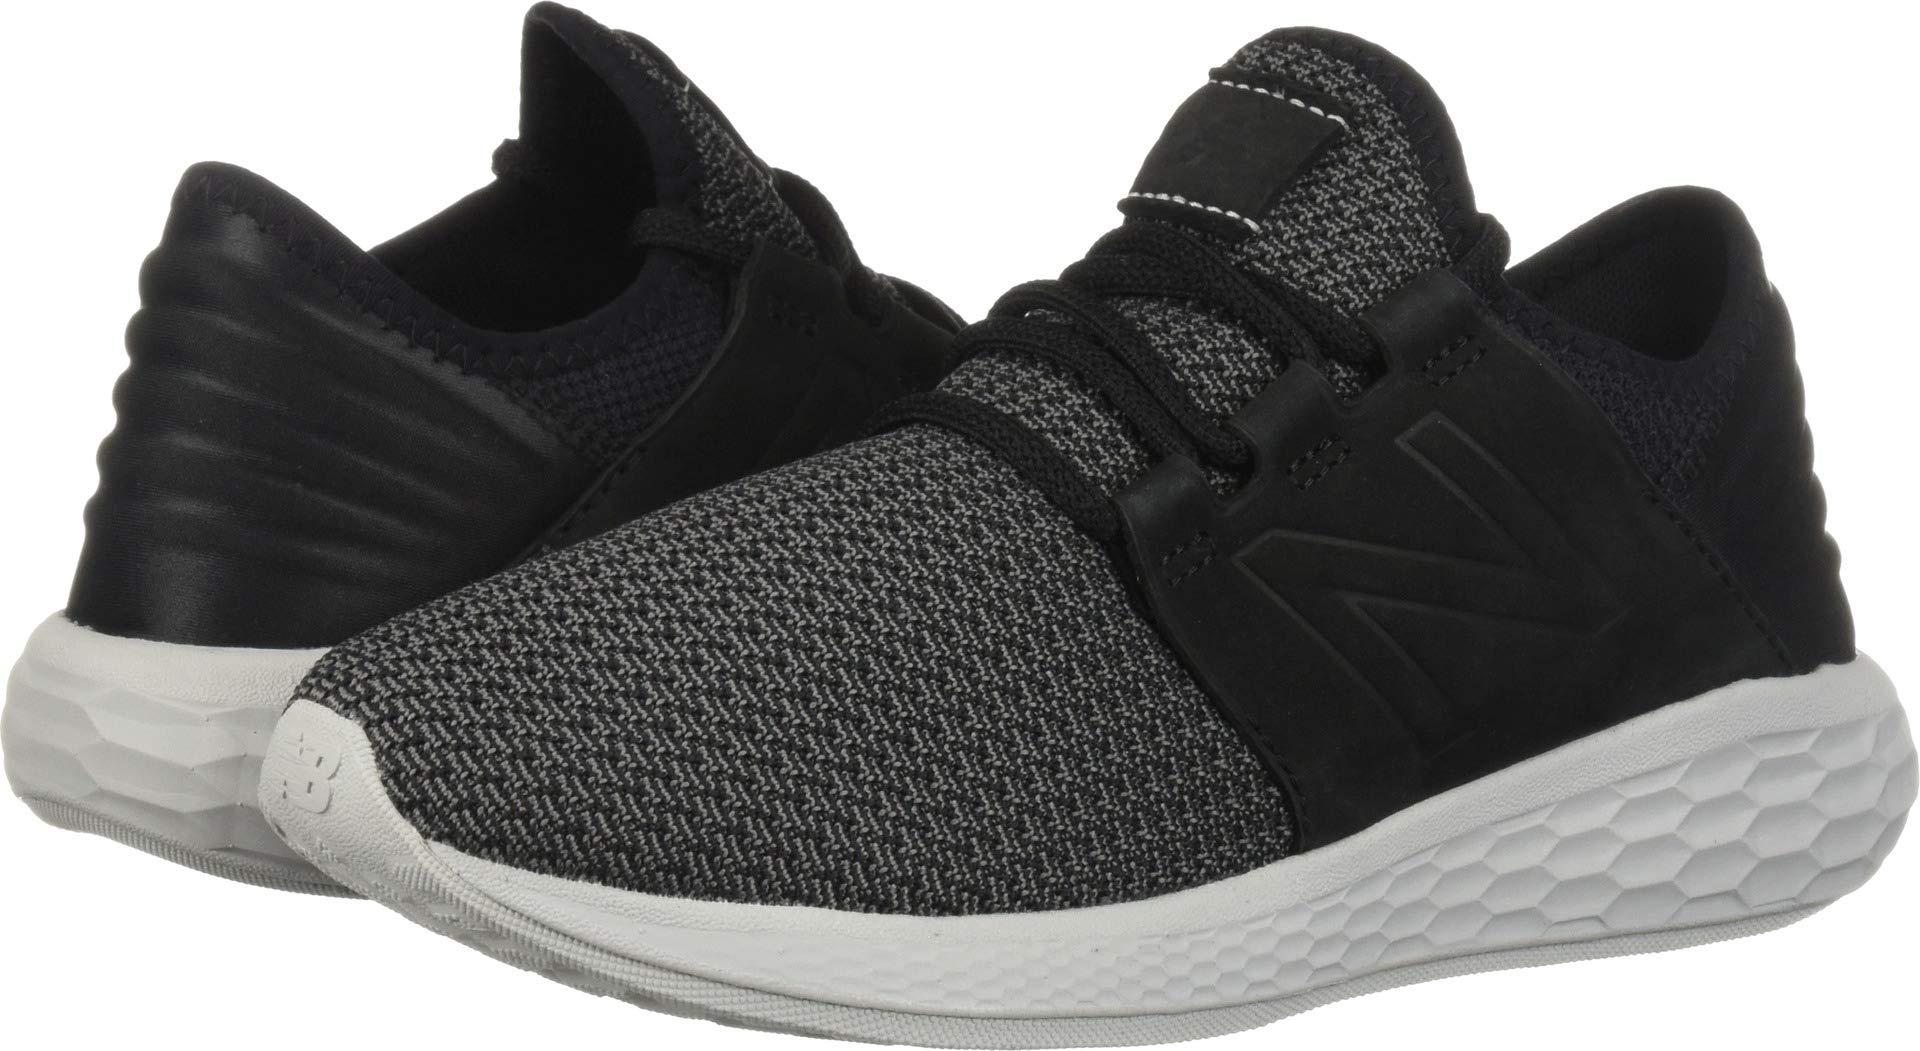 New Balance Men's Cruz V2 Fresh Foam Running Shoe, black/castlerock/nubuck, 7 D US by New Balance (Image #1)